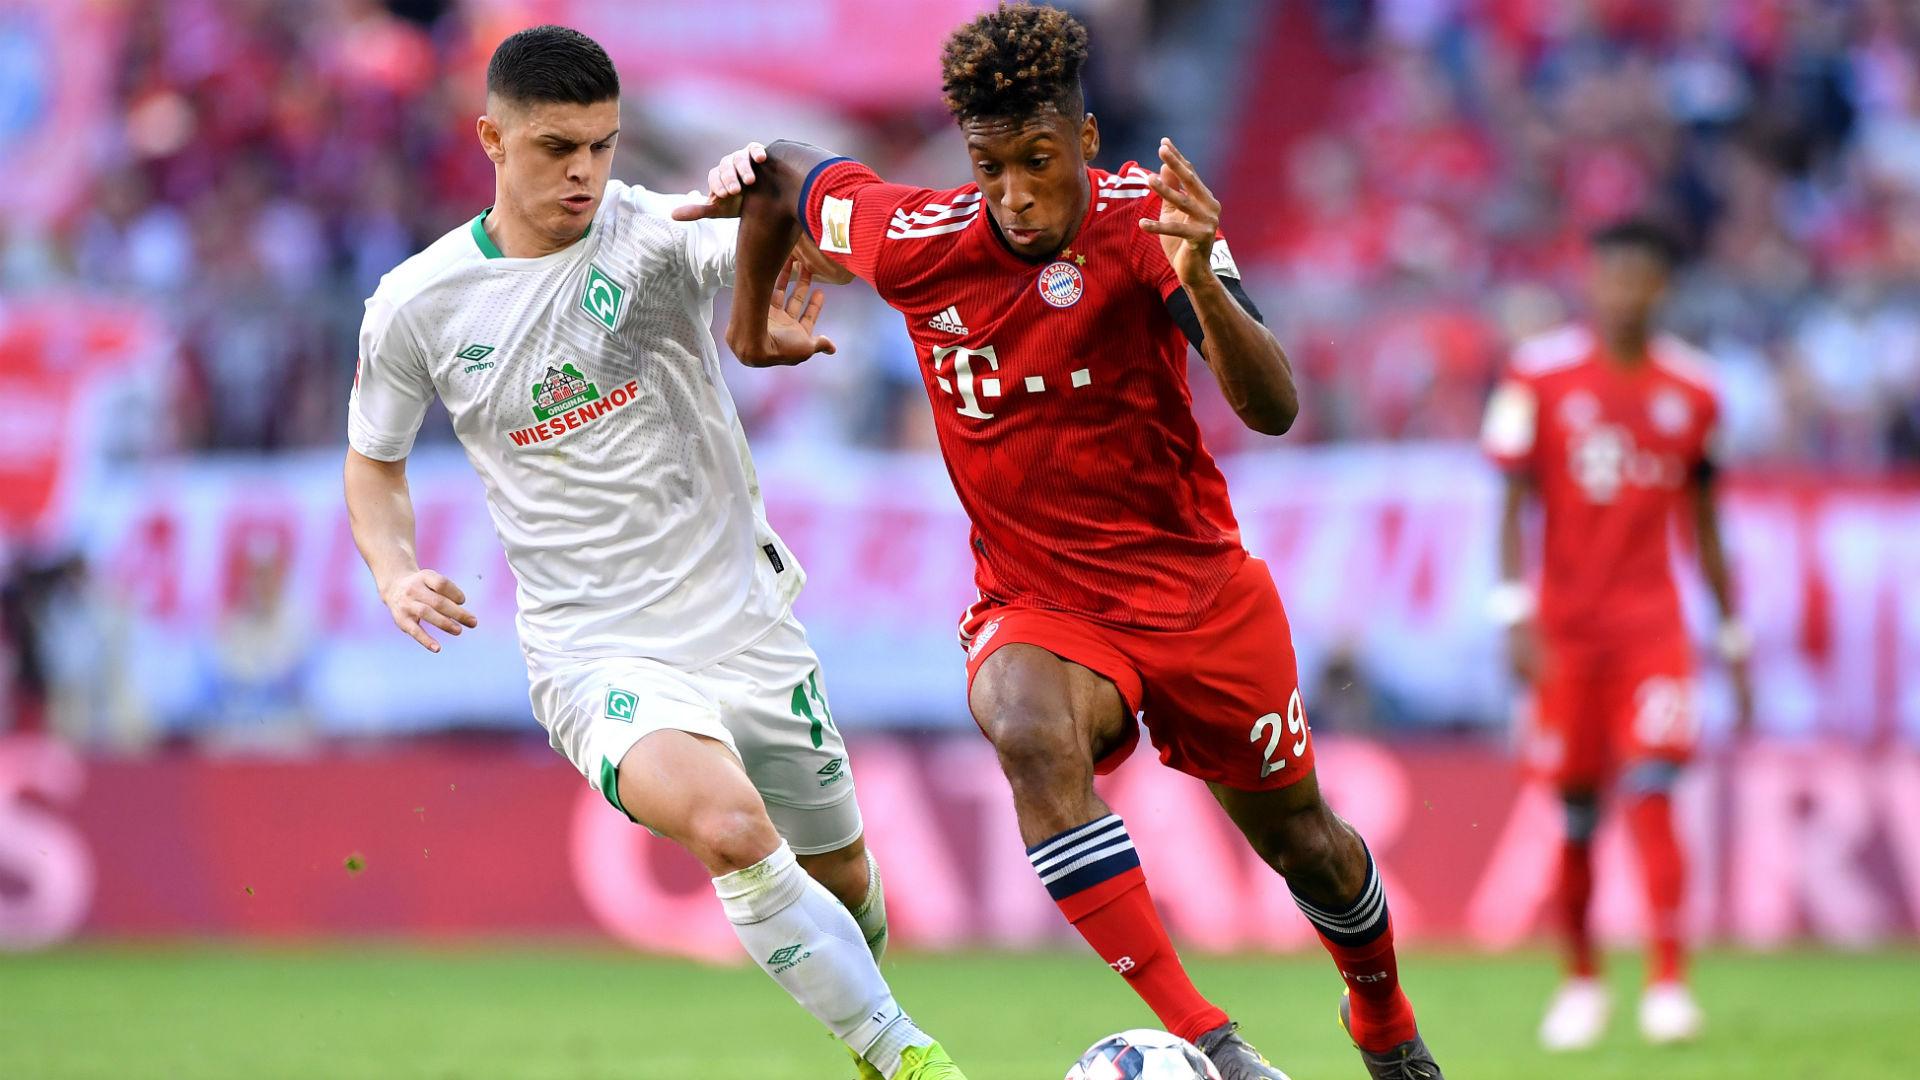 Bayern Bremen Live Stream